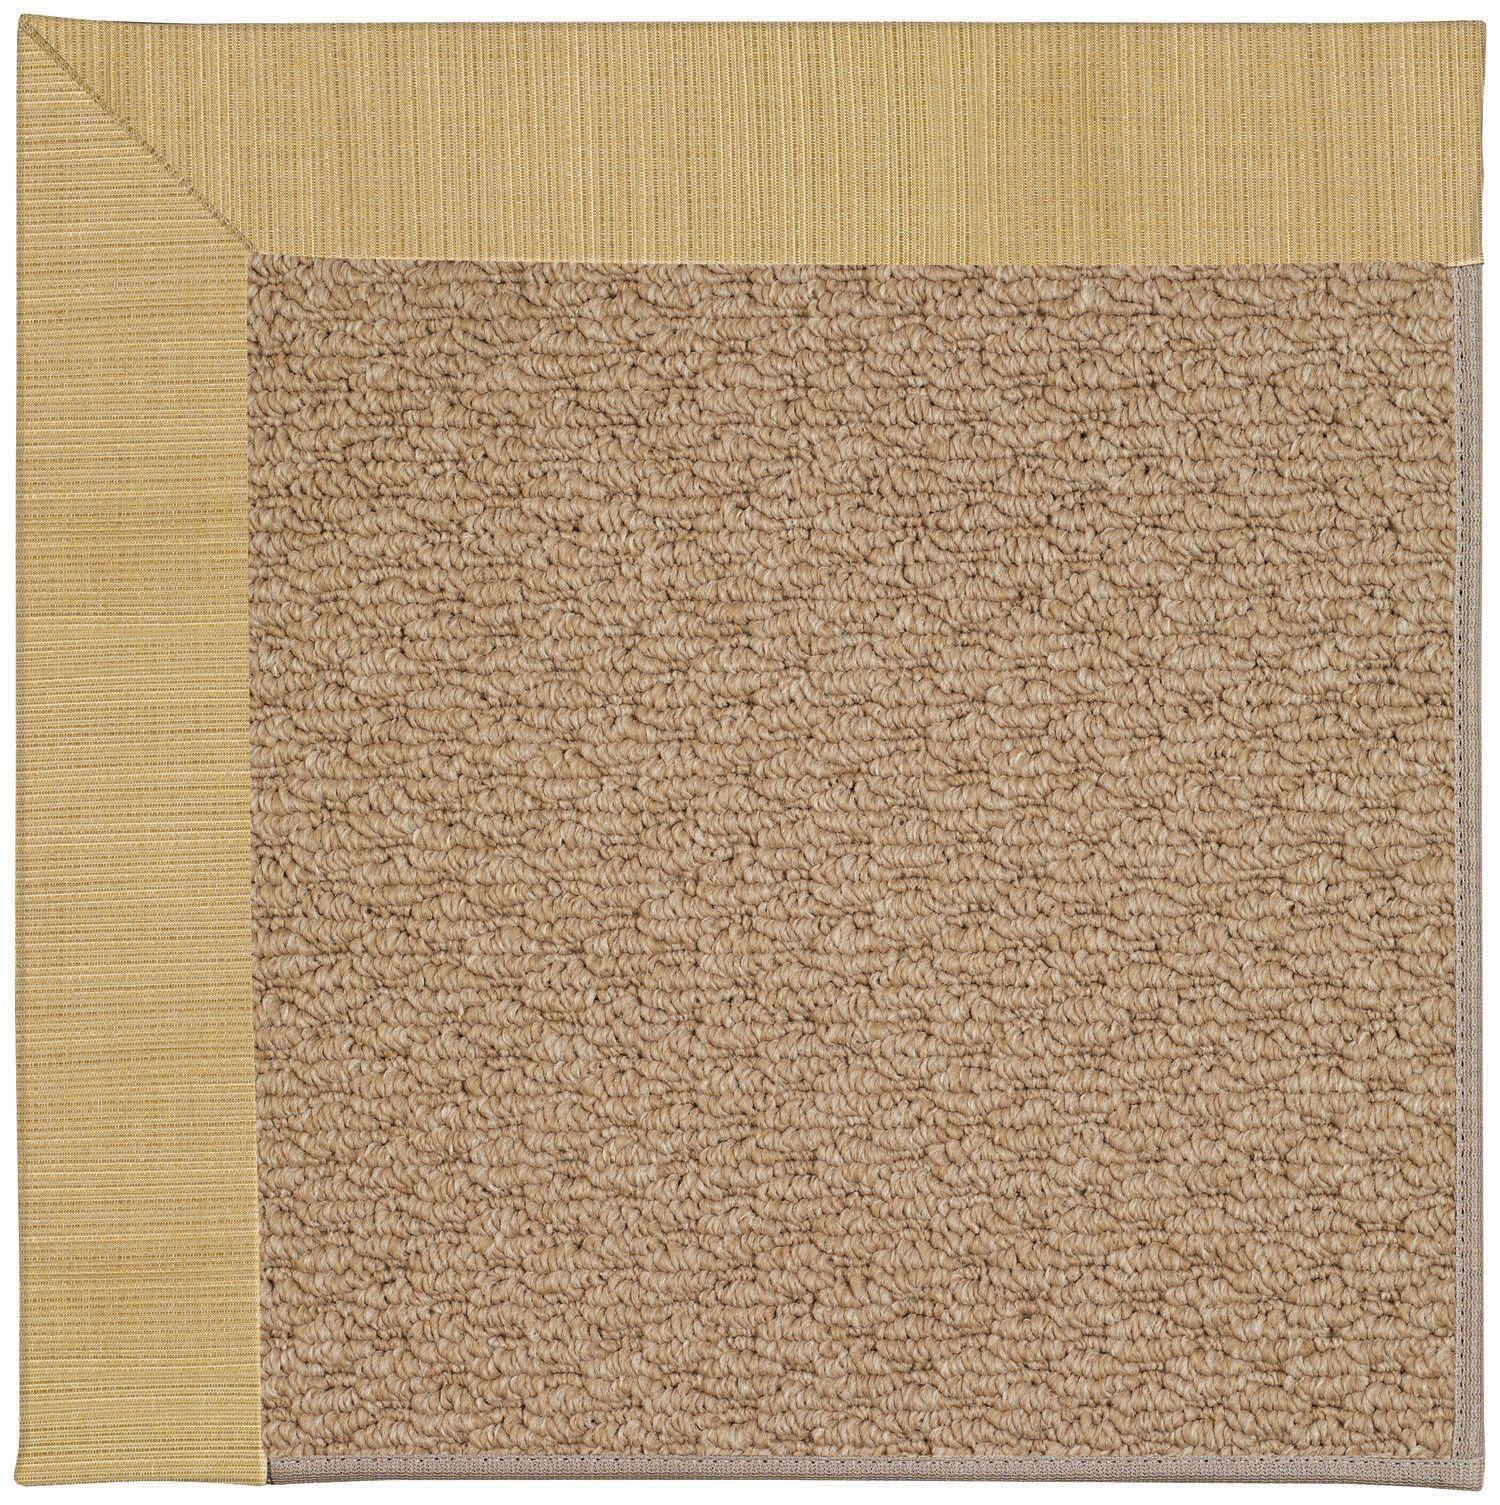 Lisle Machine Tufted Bramble Indoor/Outdoor Area Rug Rug Size: Square 8'